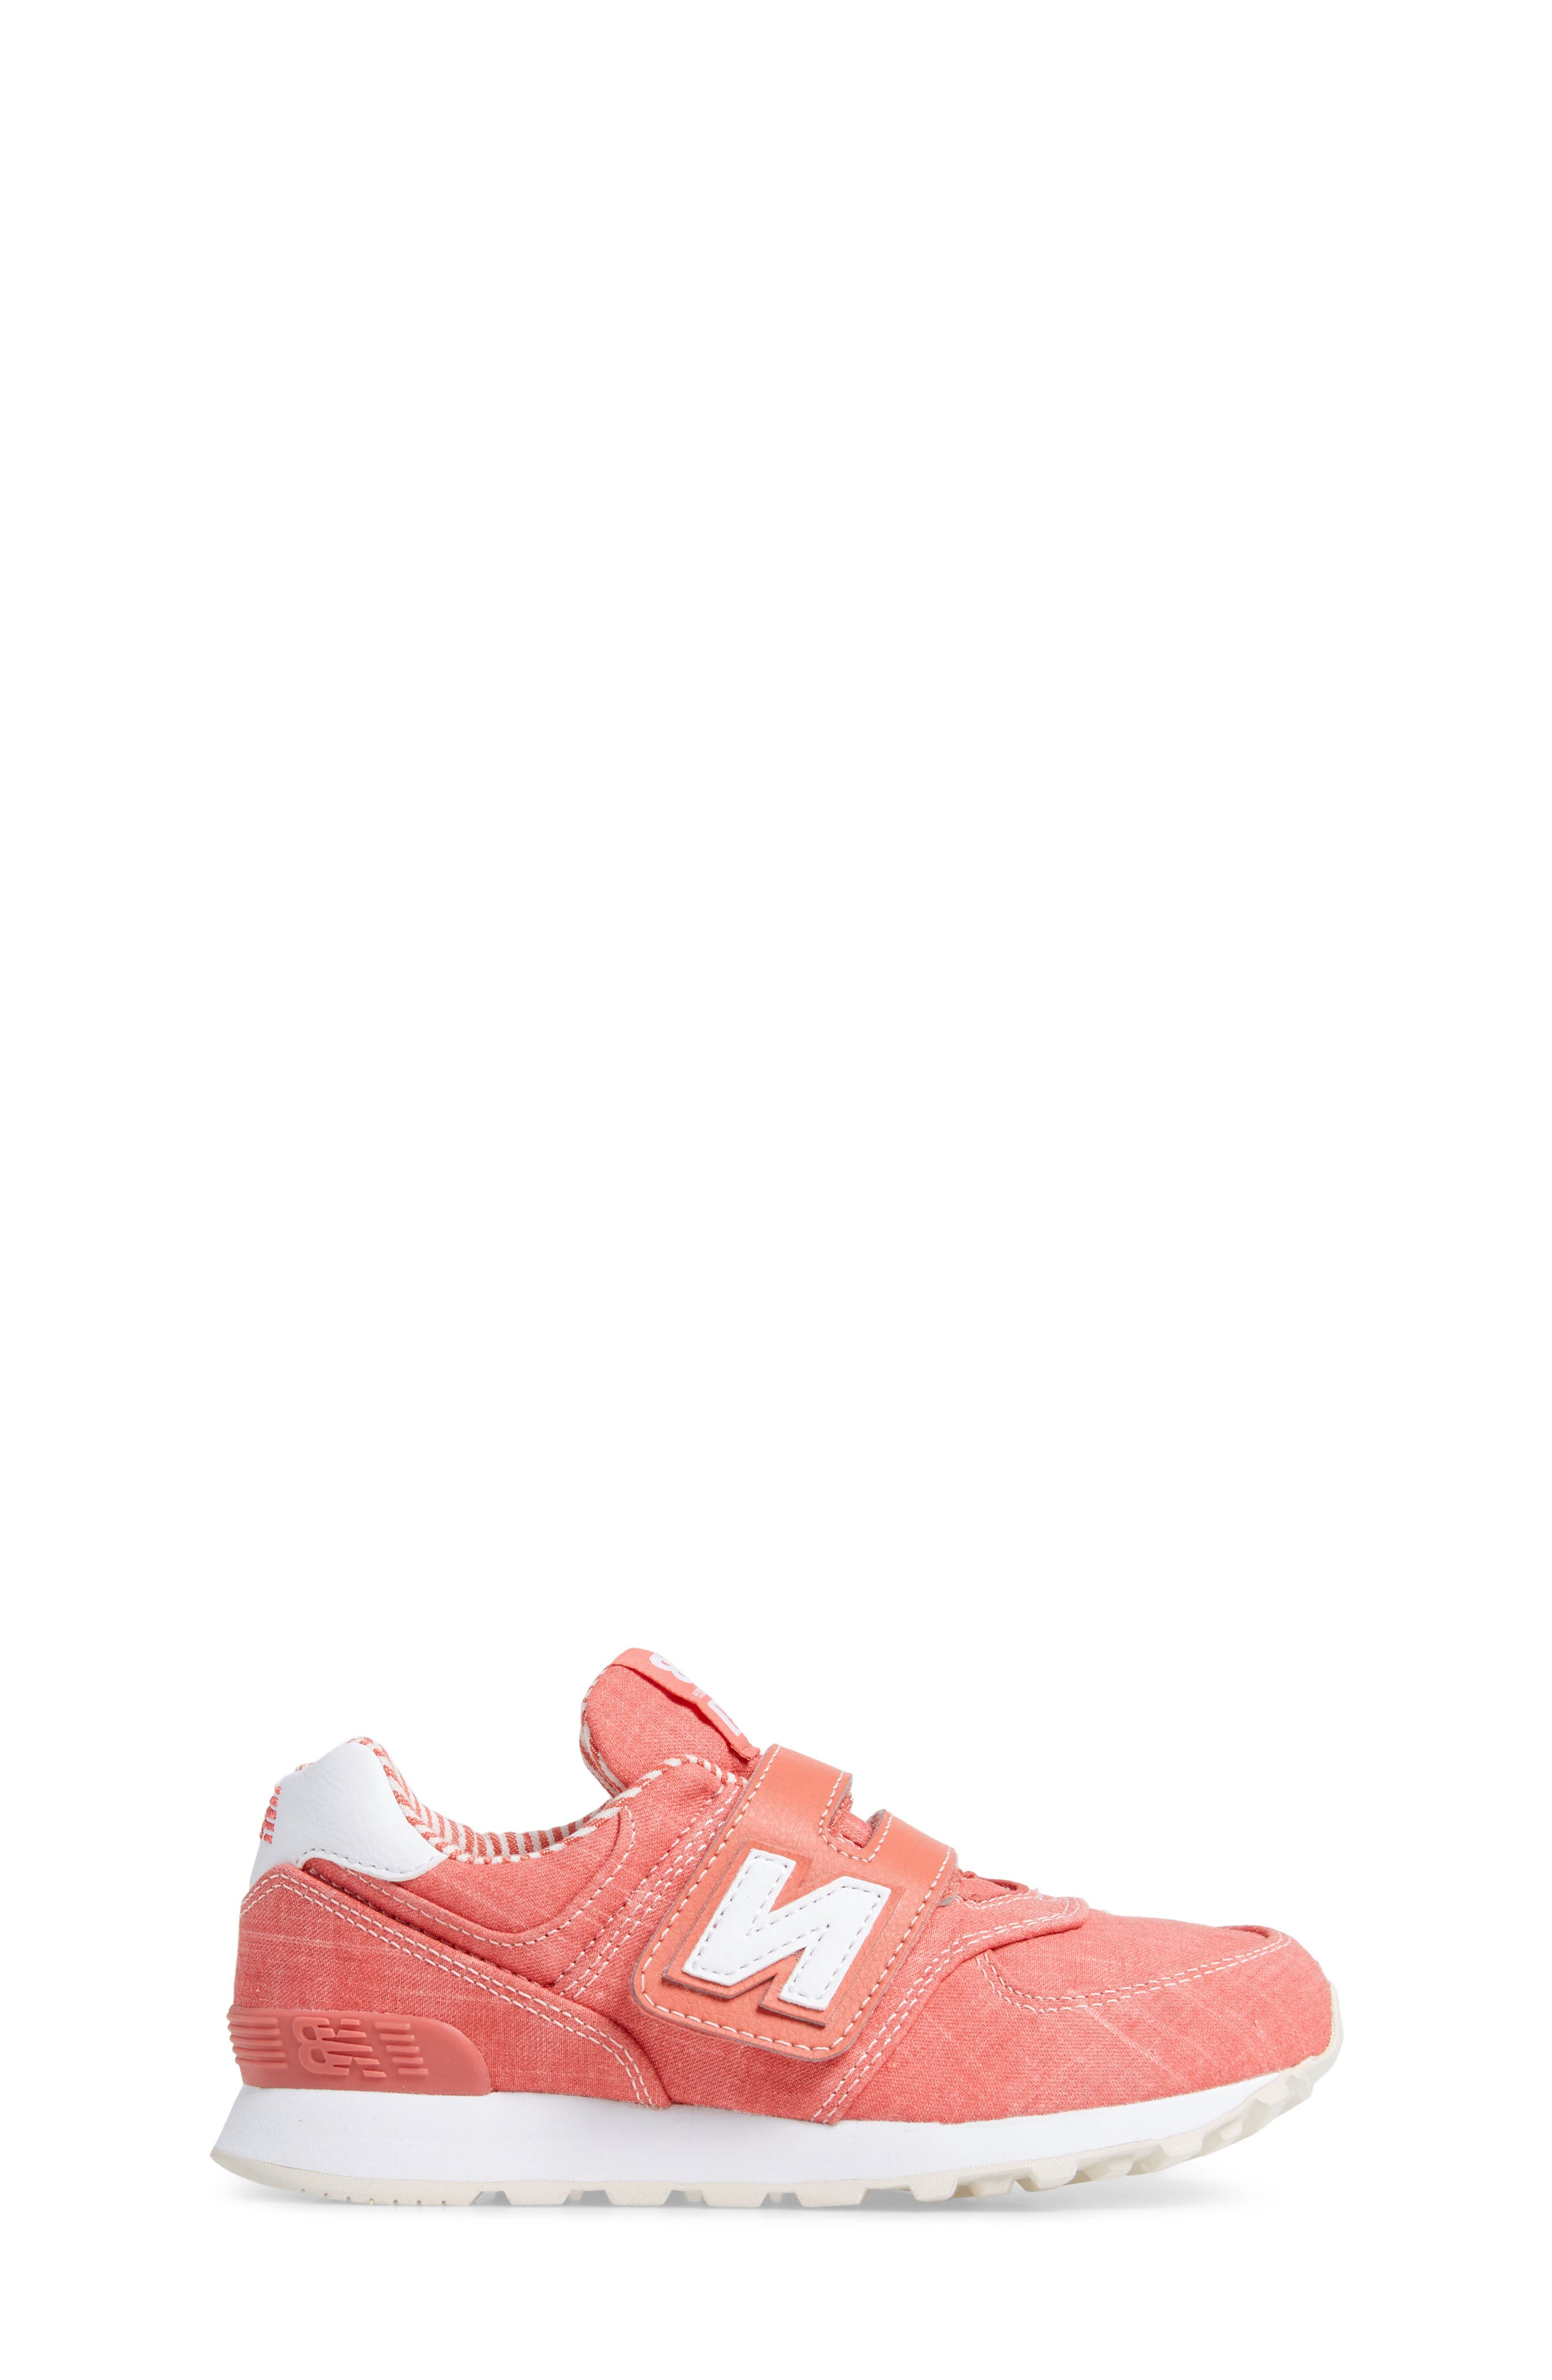 574v1 Sneaker,                             Alternate thumbnail 3, color,                             Coral